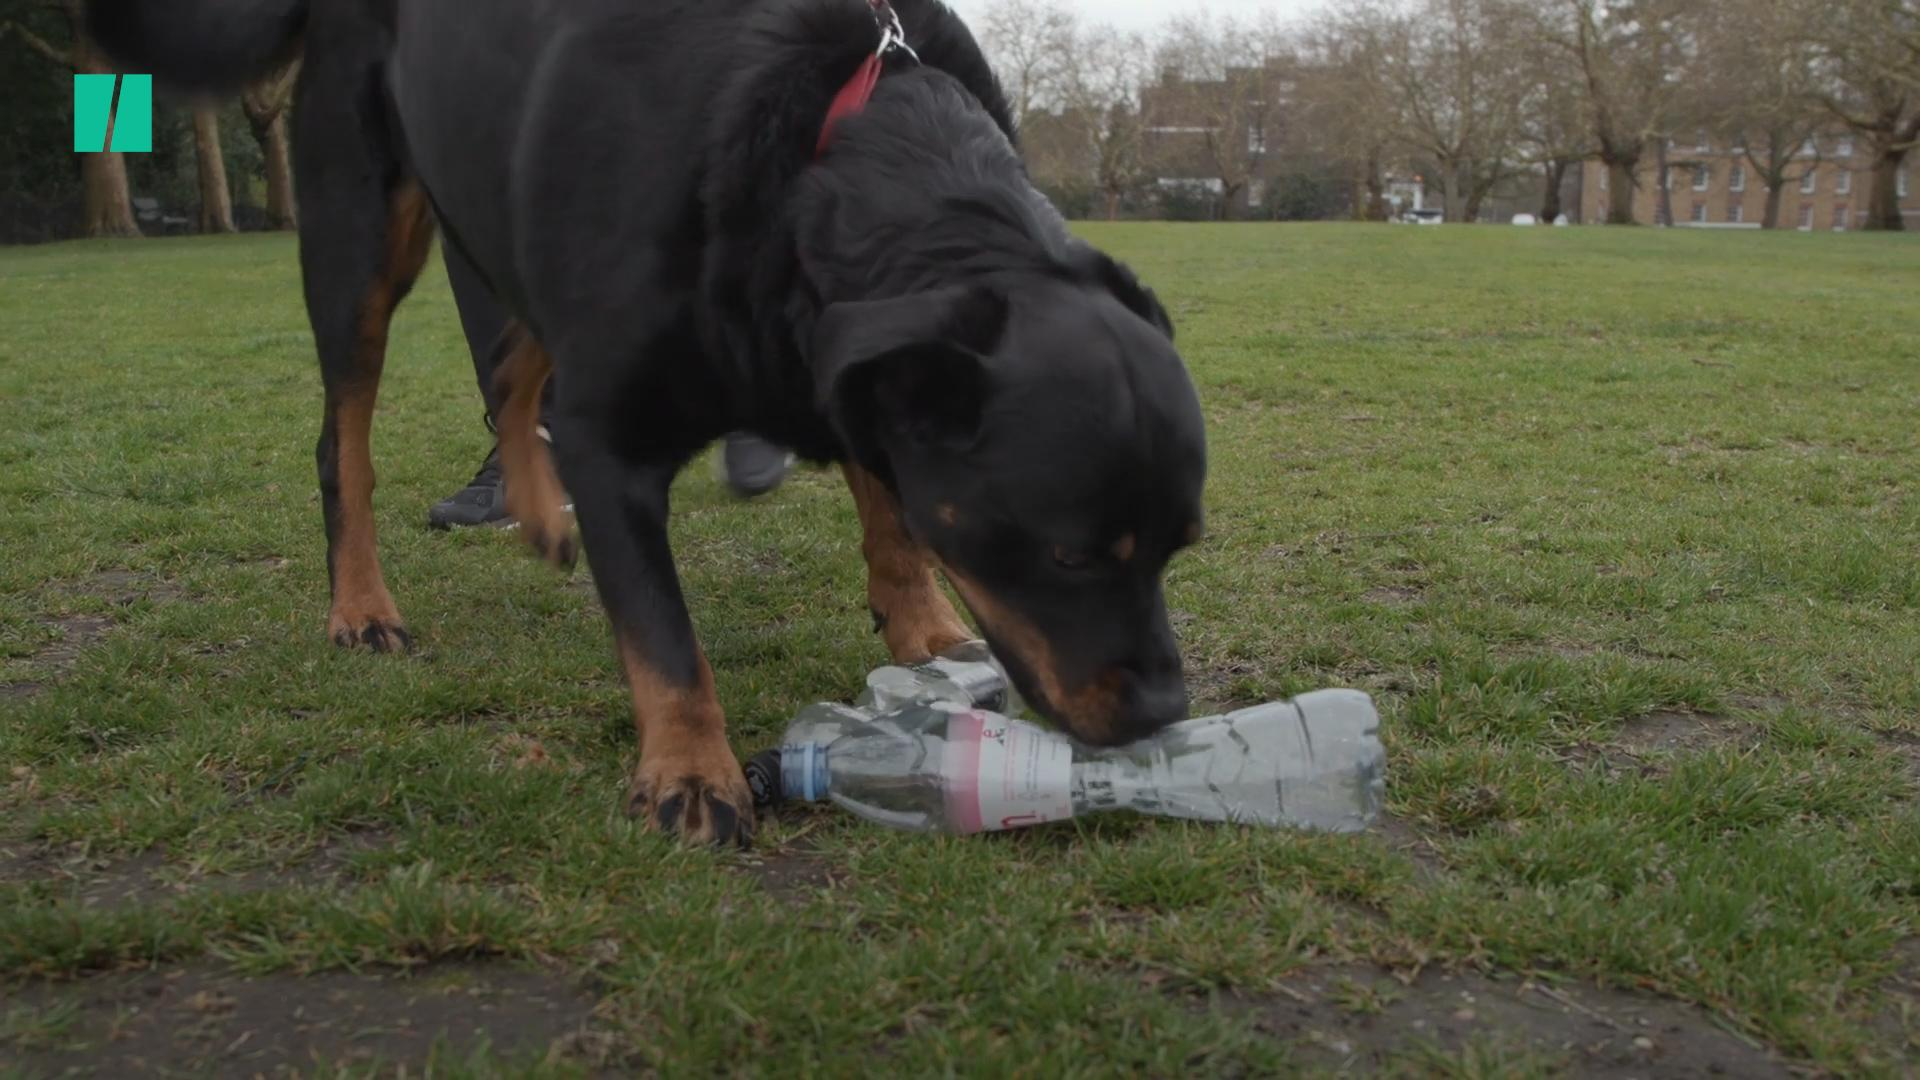 Meet Maggie The Litter-Picking Dog